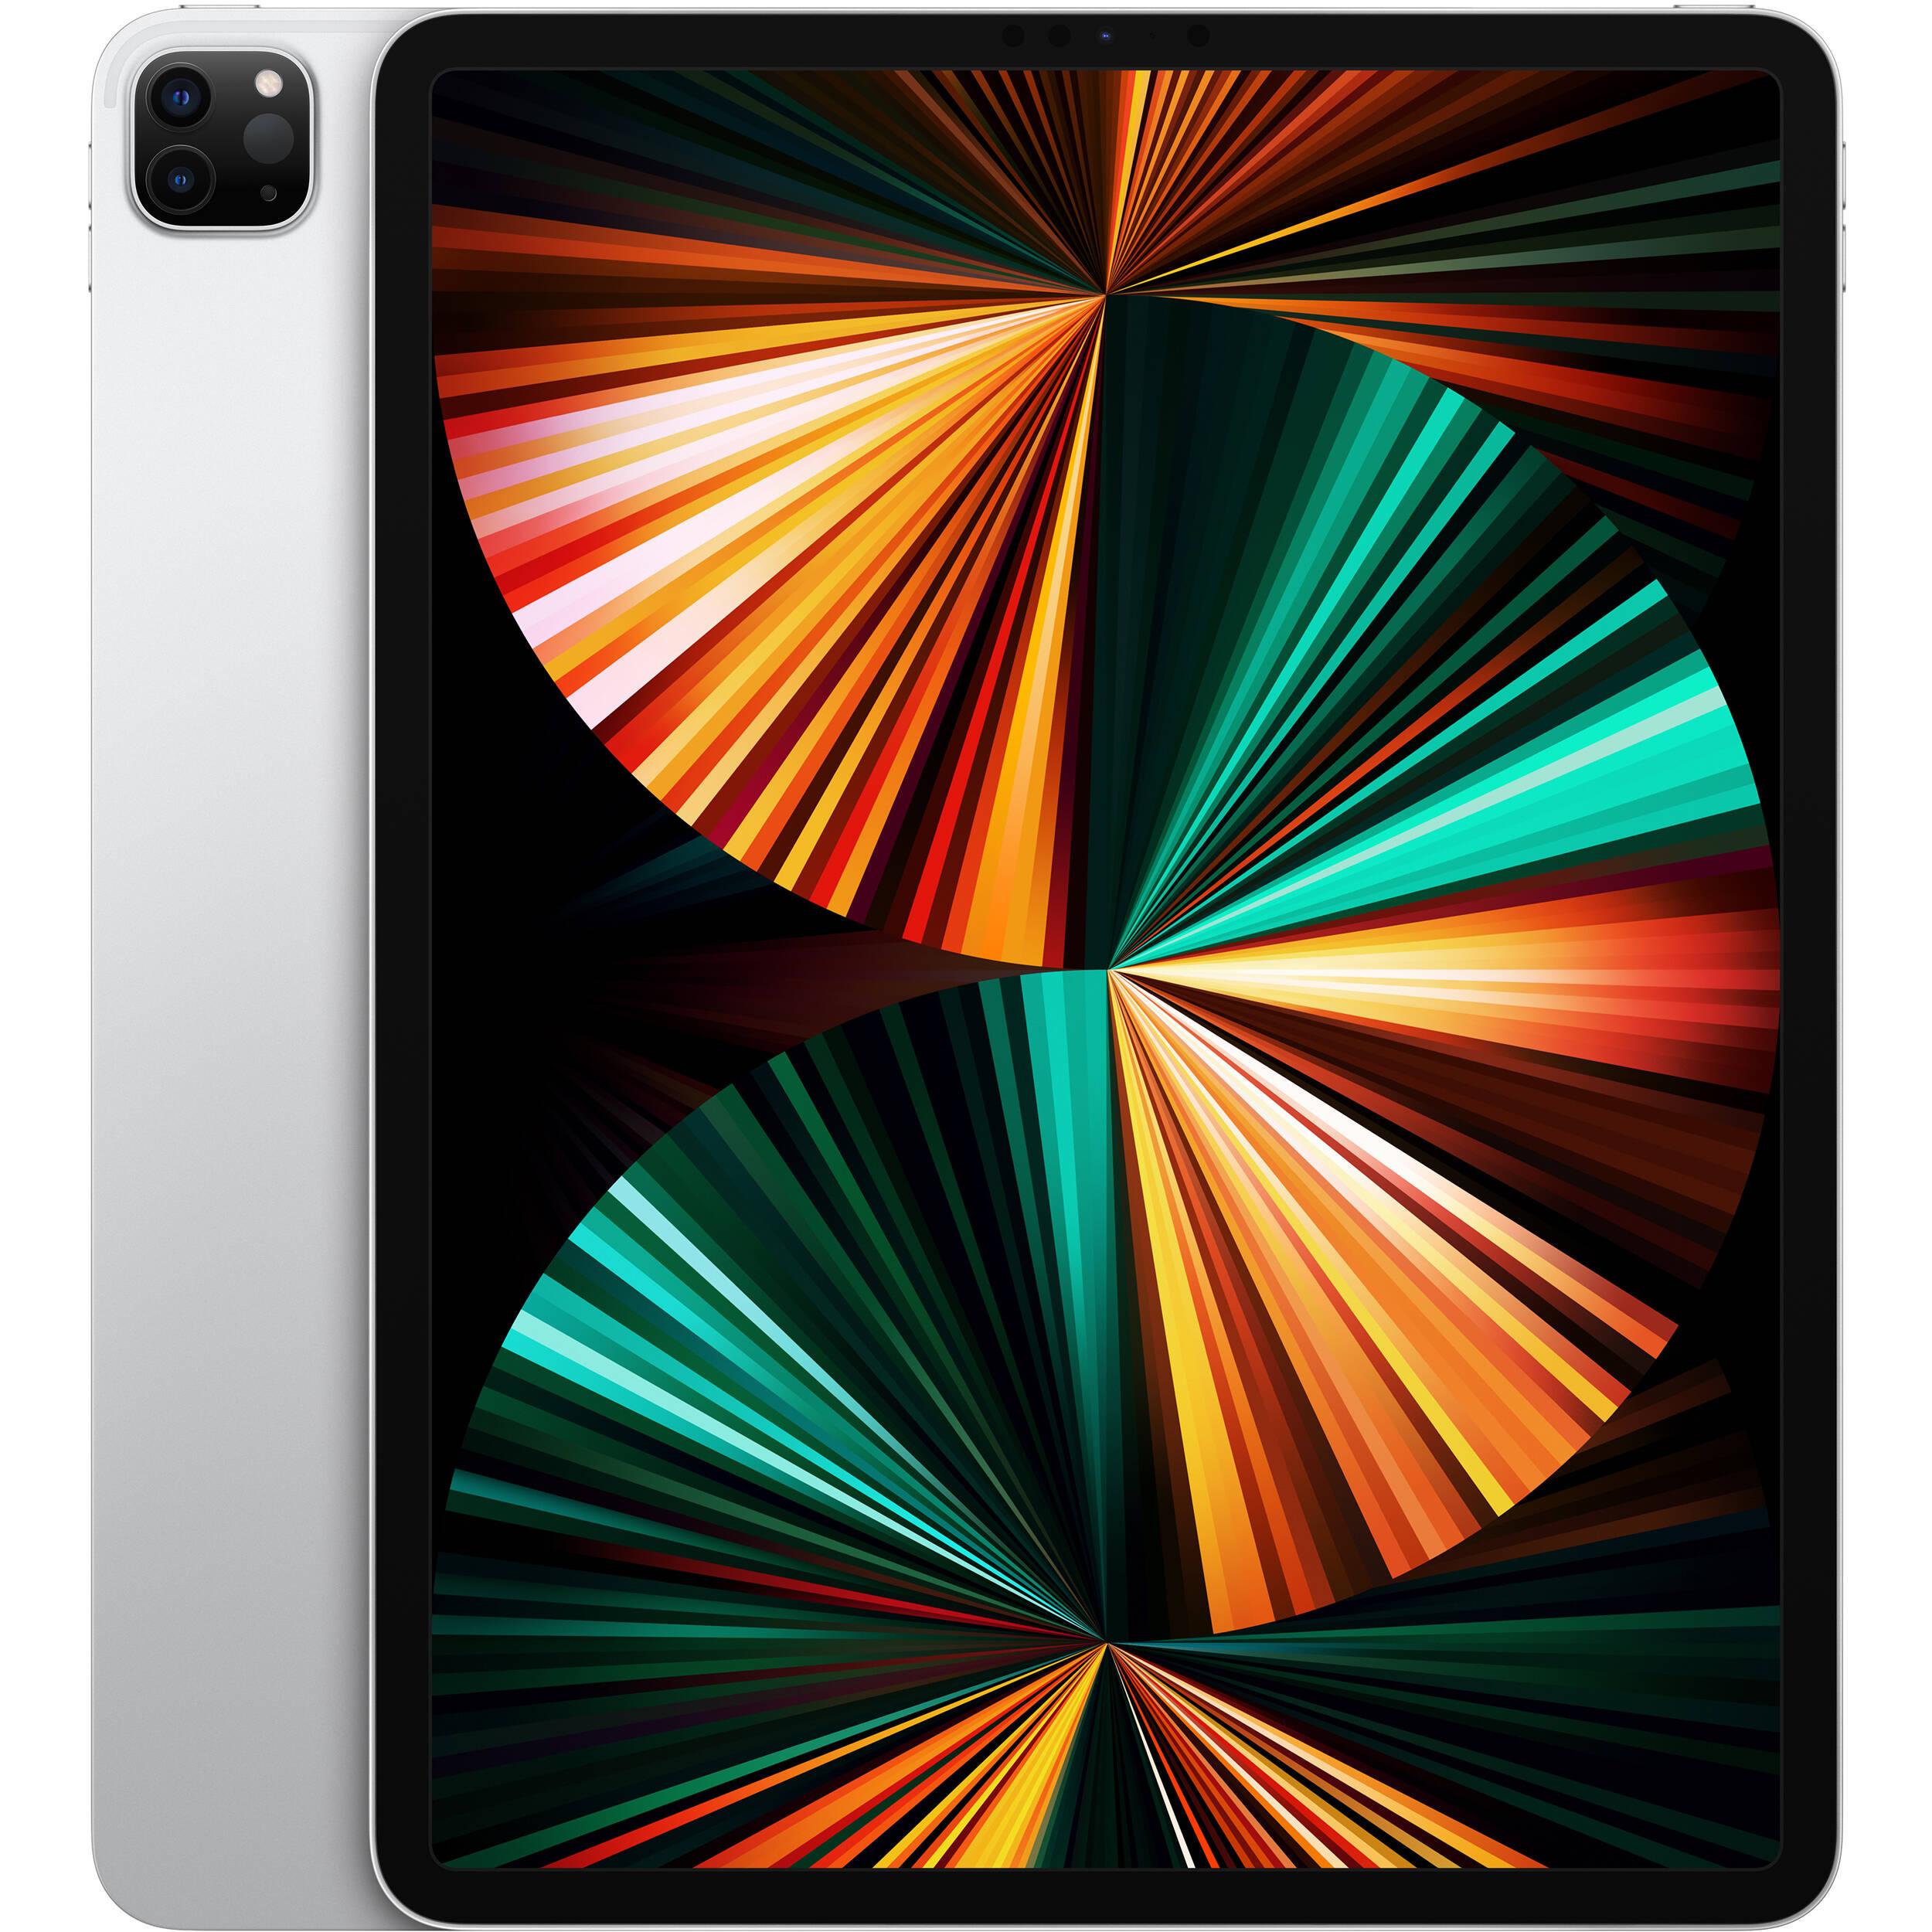 "Apple 12.9"" iPad Pro M1 Chip MHNG3LL/A B&H Photo Video"